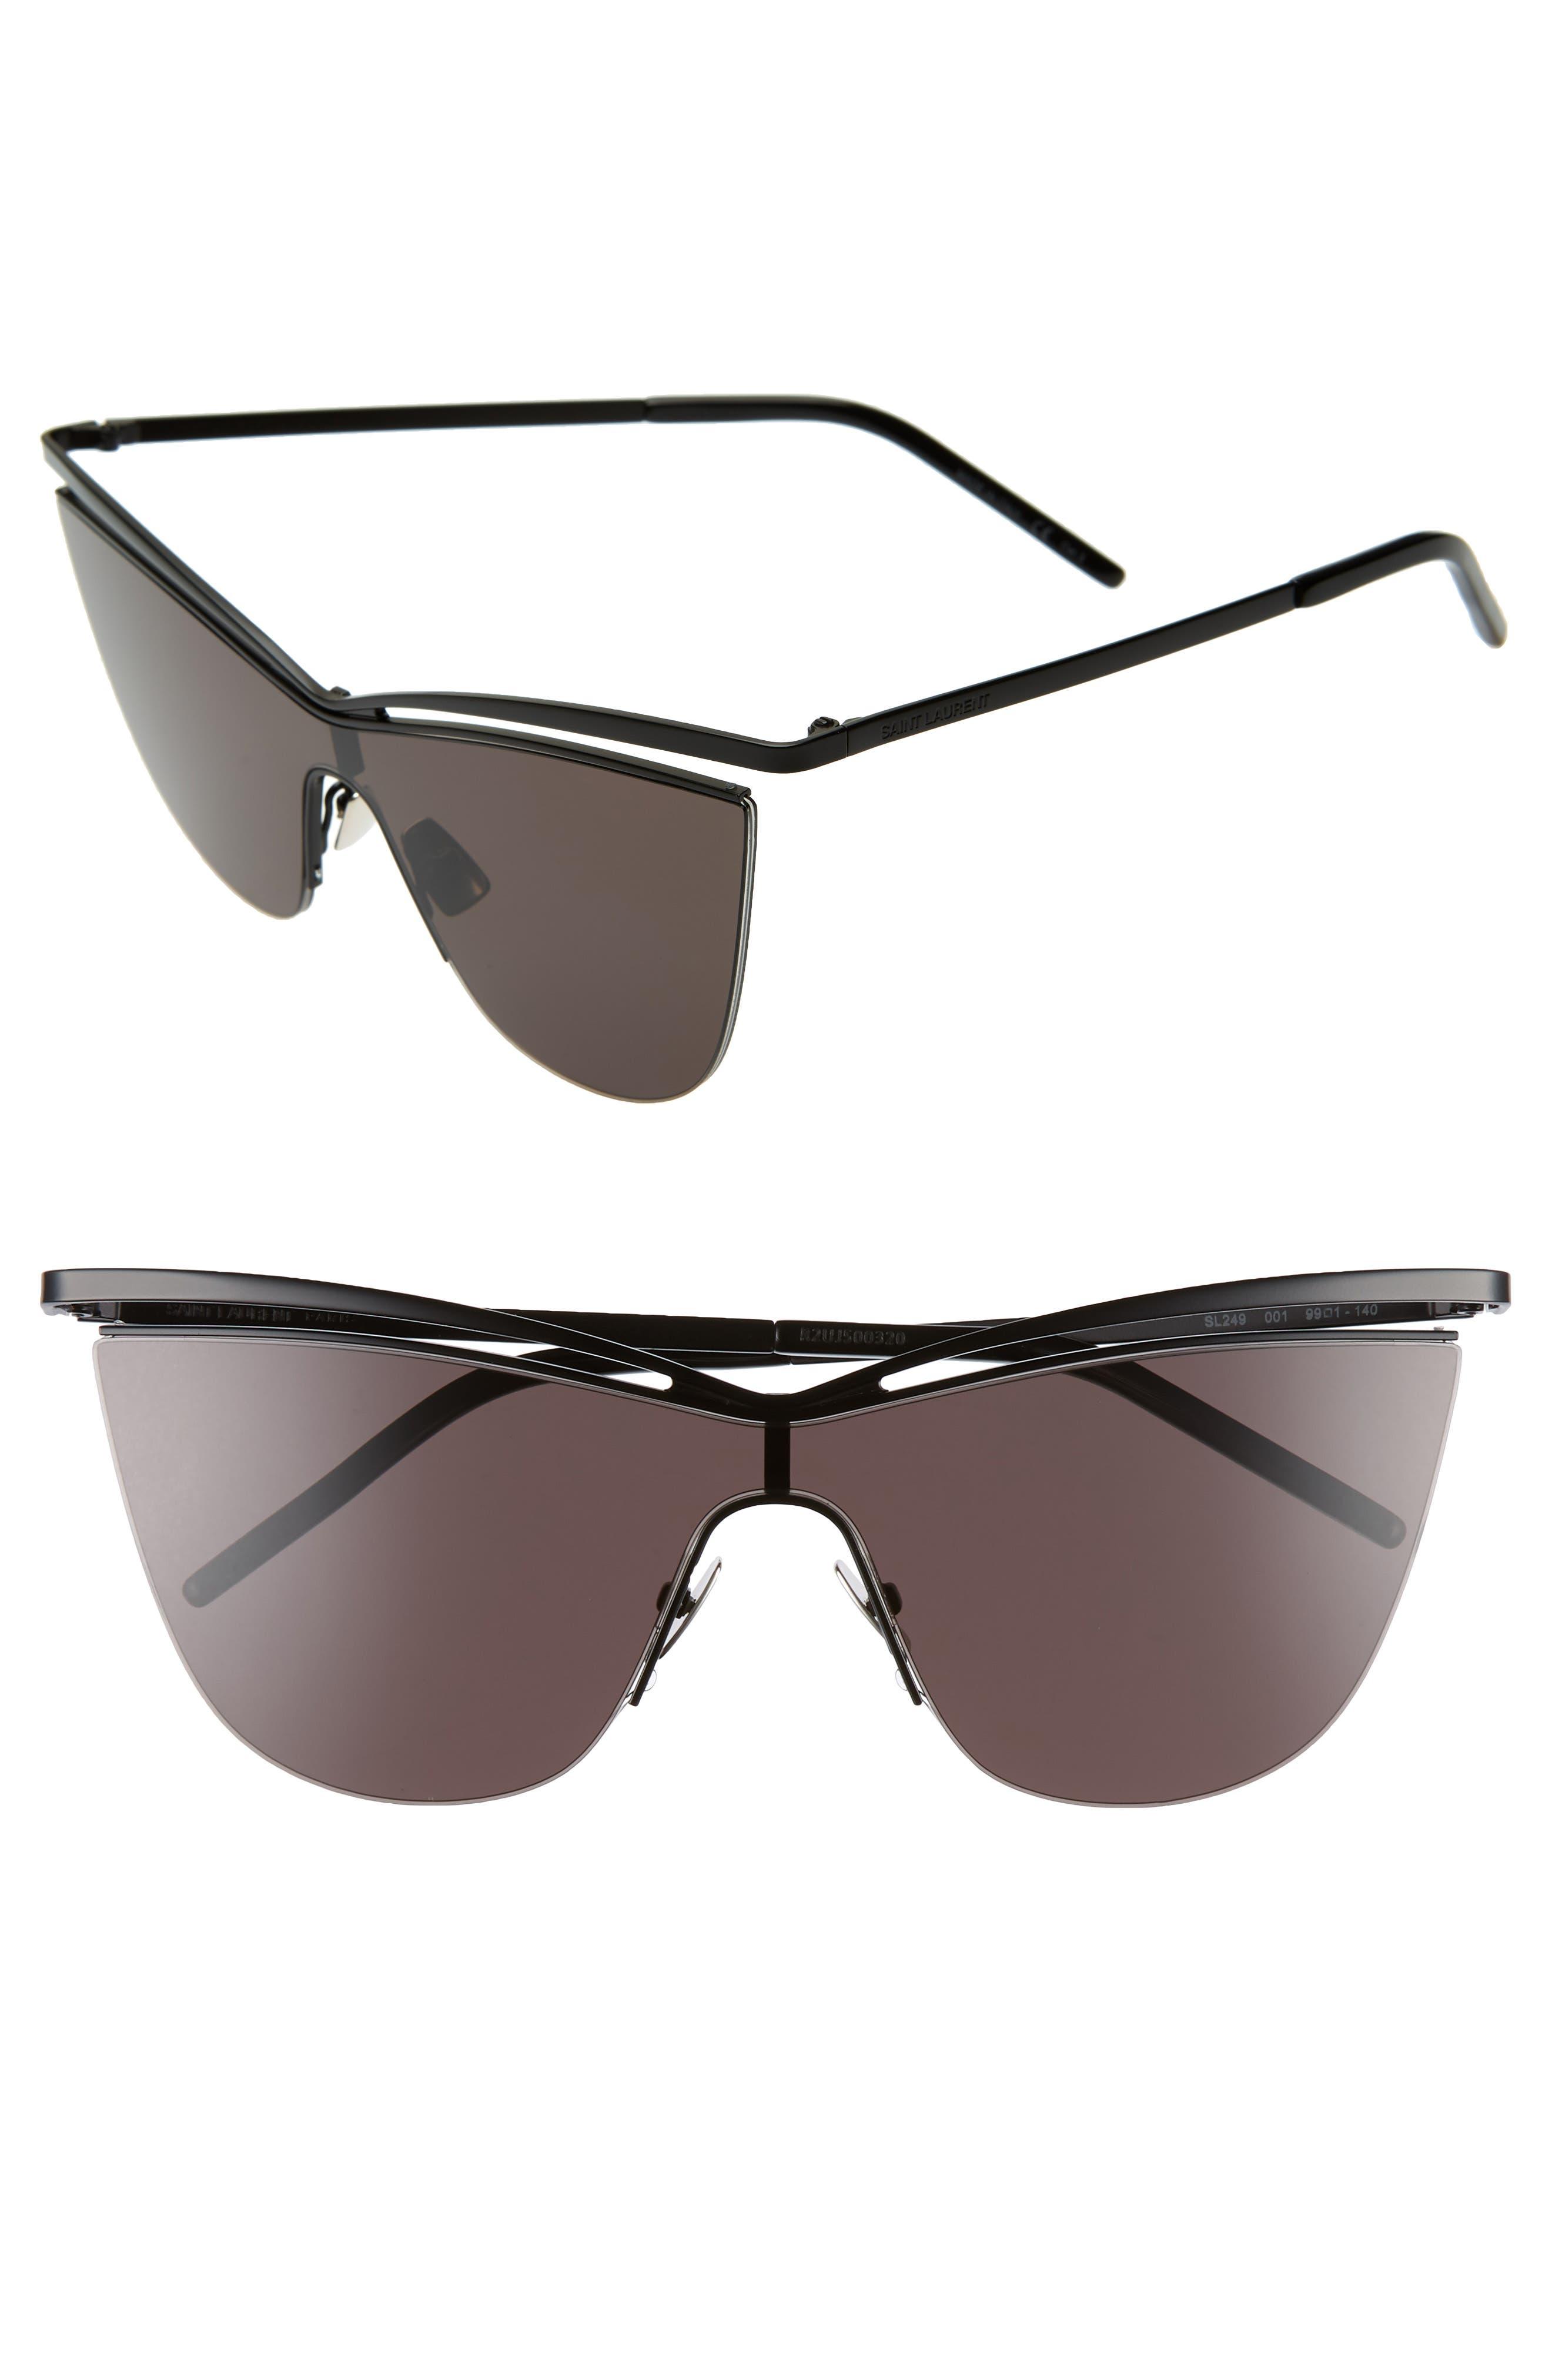 134mm Cat Eye Shield Sunglasses,                             Main thumbnail 1, color,                             BLACK/ BLACK